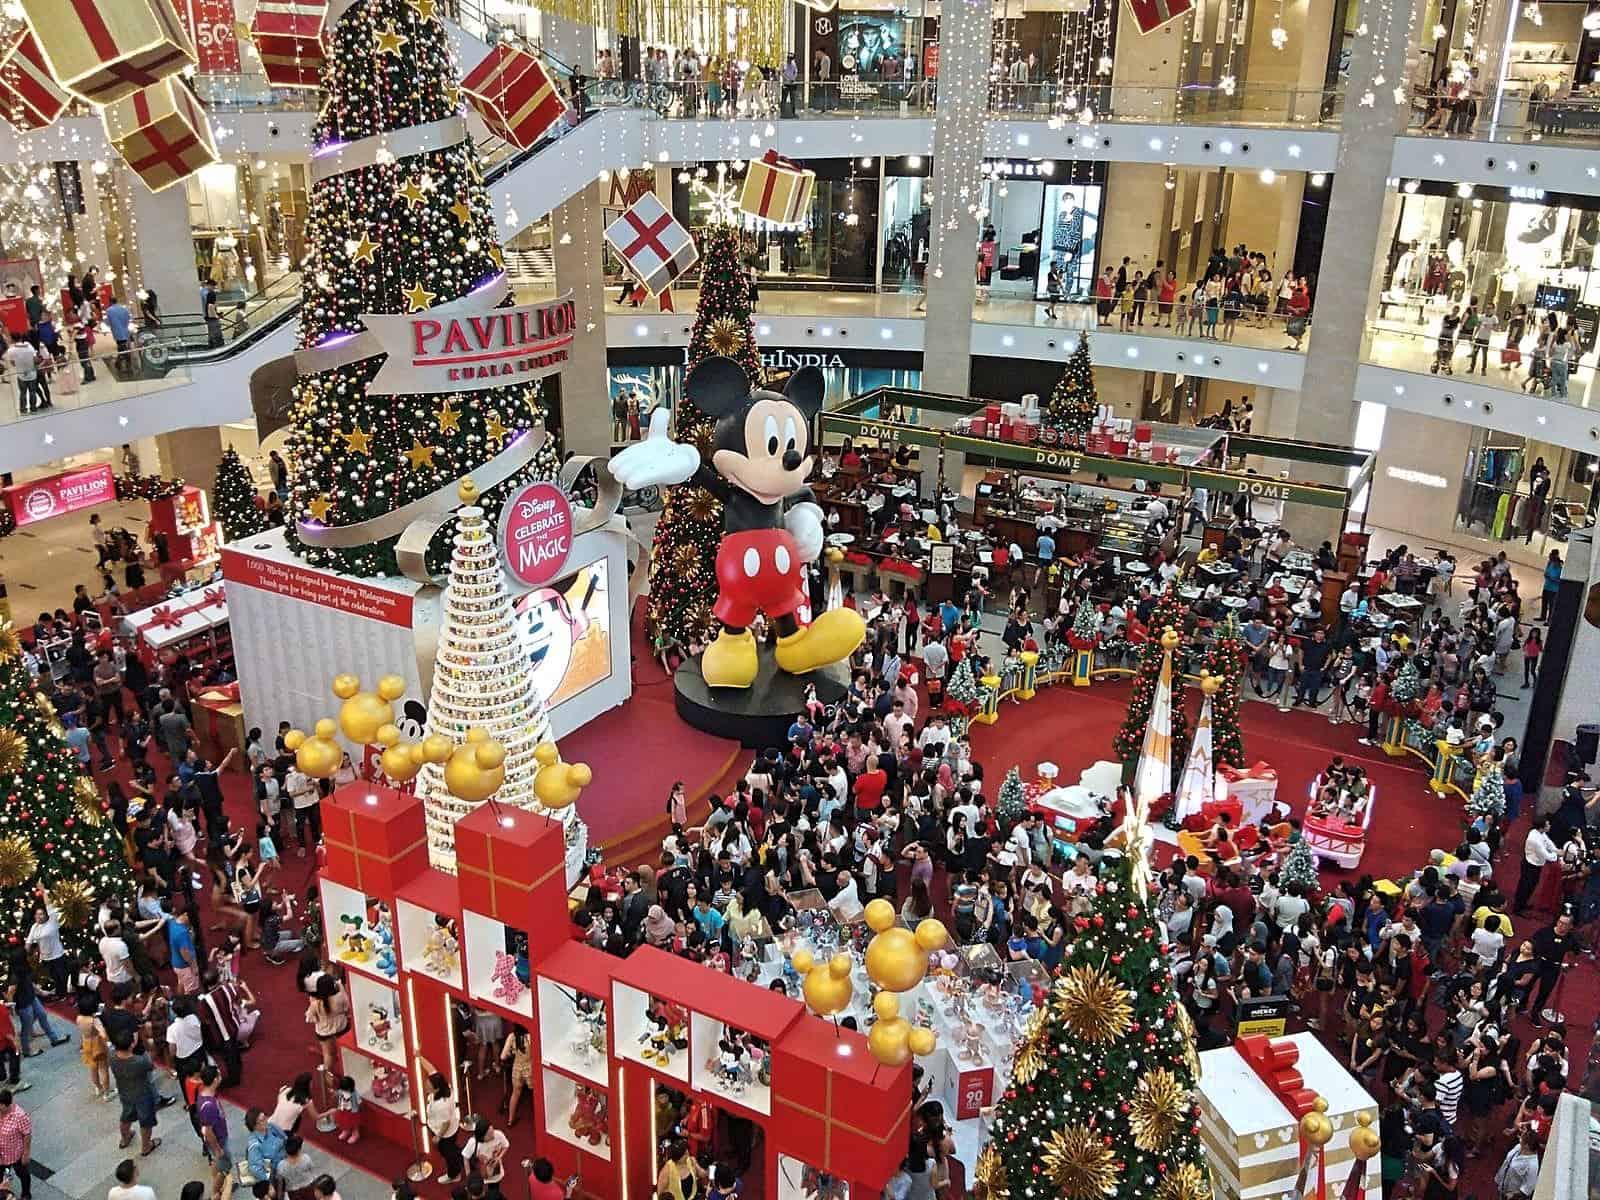 Pavilion-shopping-centre-Christmas-Kuala-Lumpur-Malaysia ] Travel Mermaid